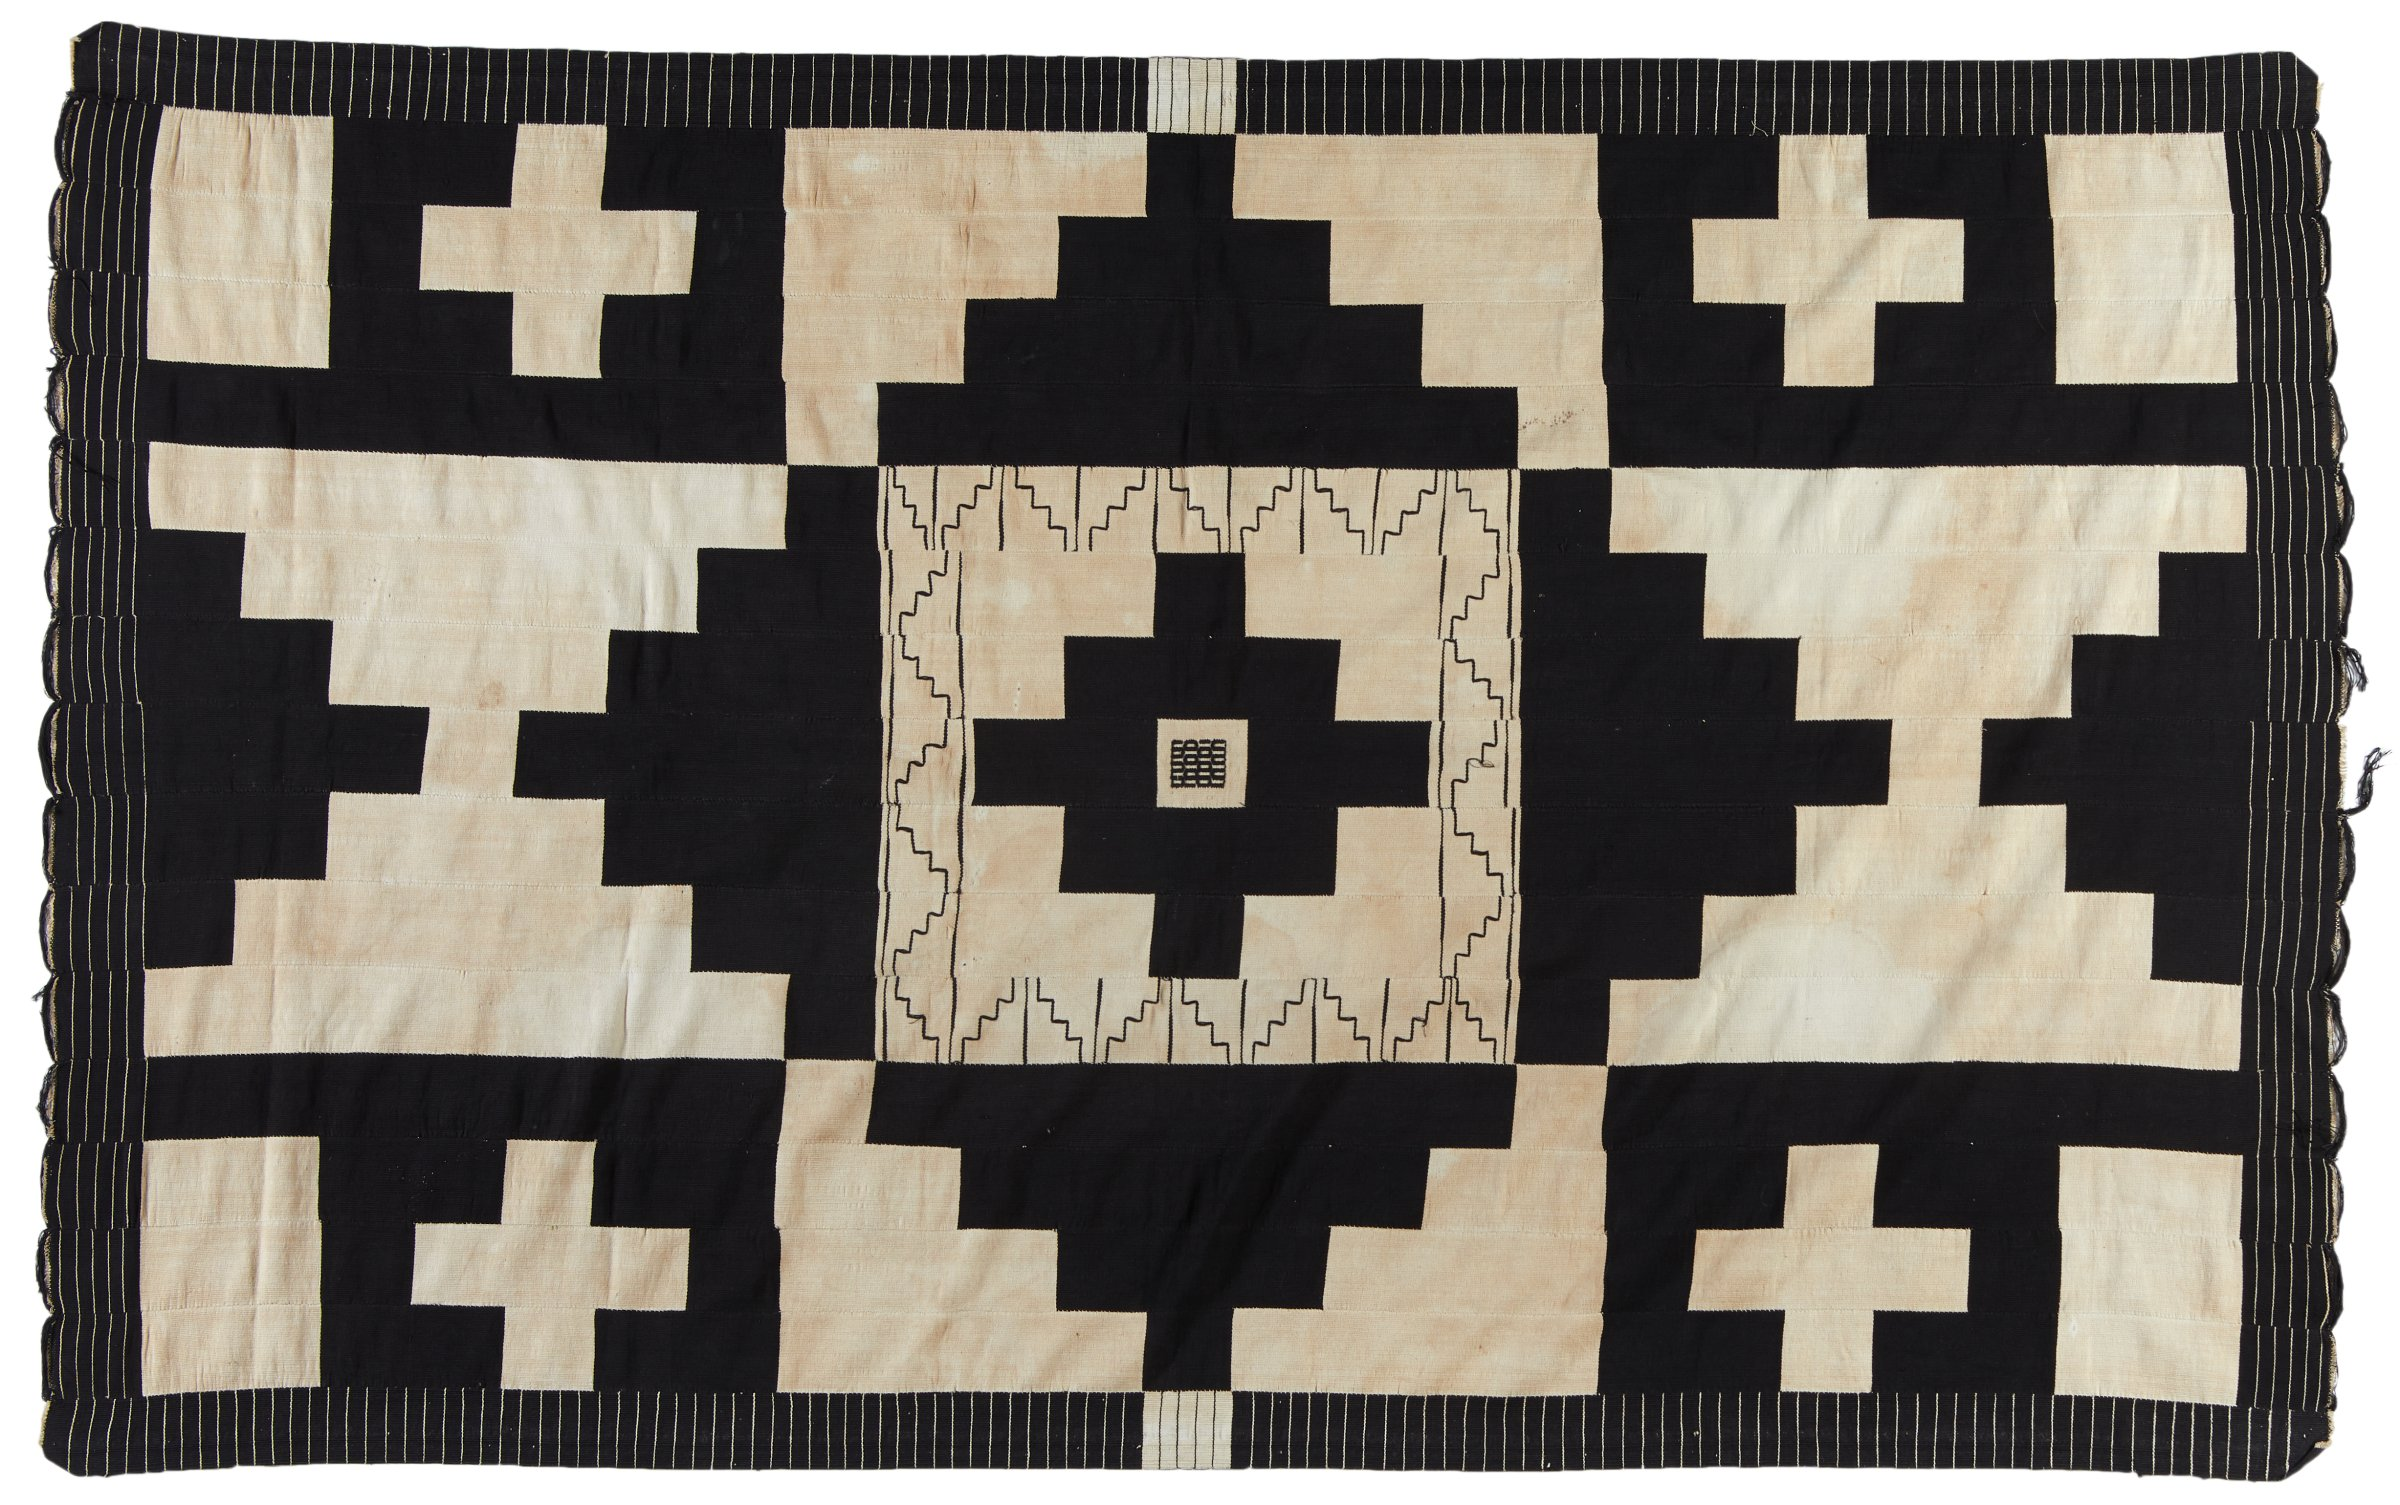 Black and white blanket, strip-woven with stepped design, made by Vasili or Vassili, master weaver?